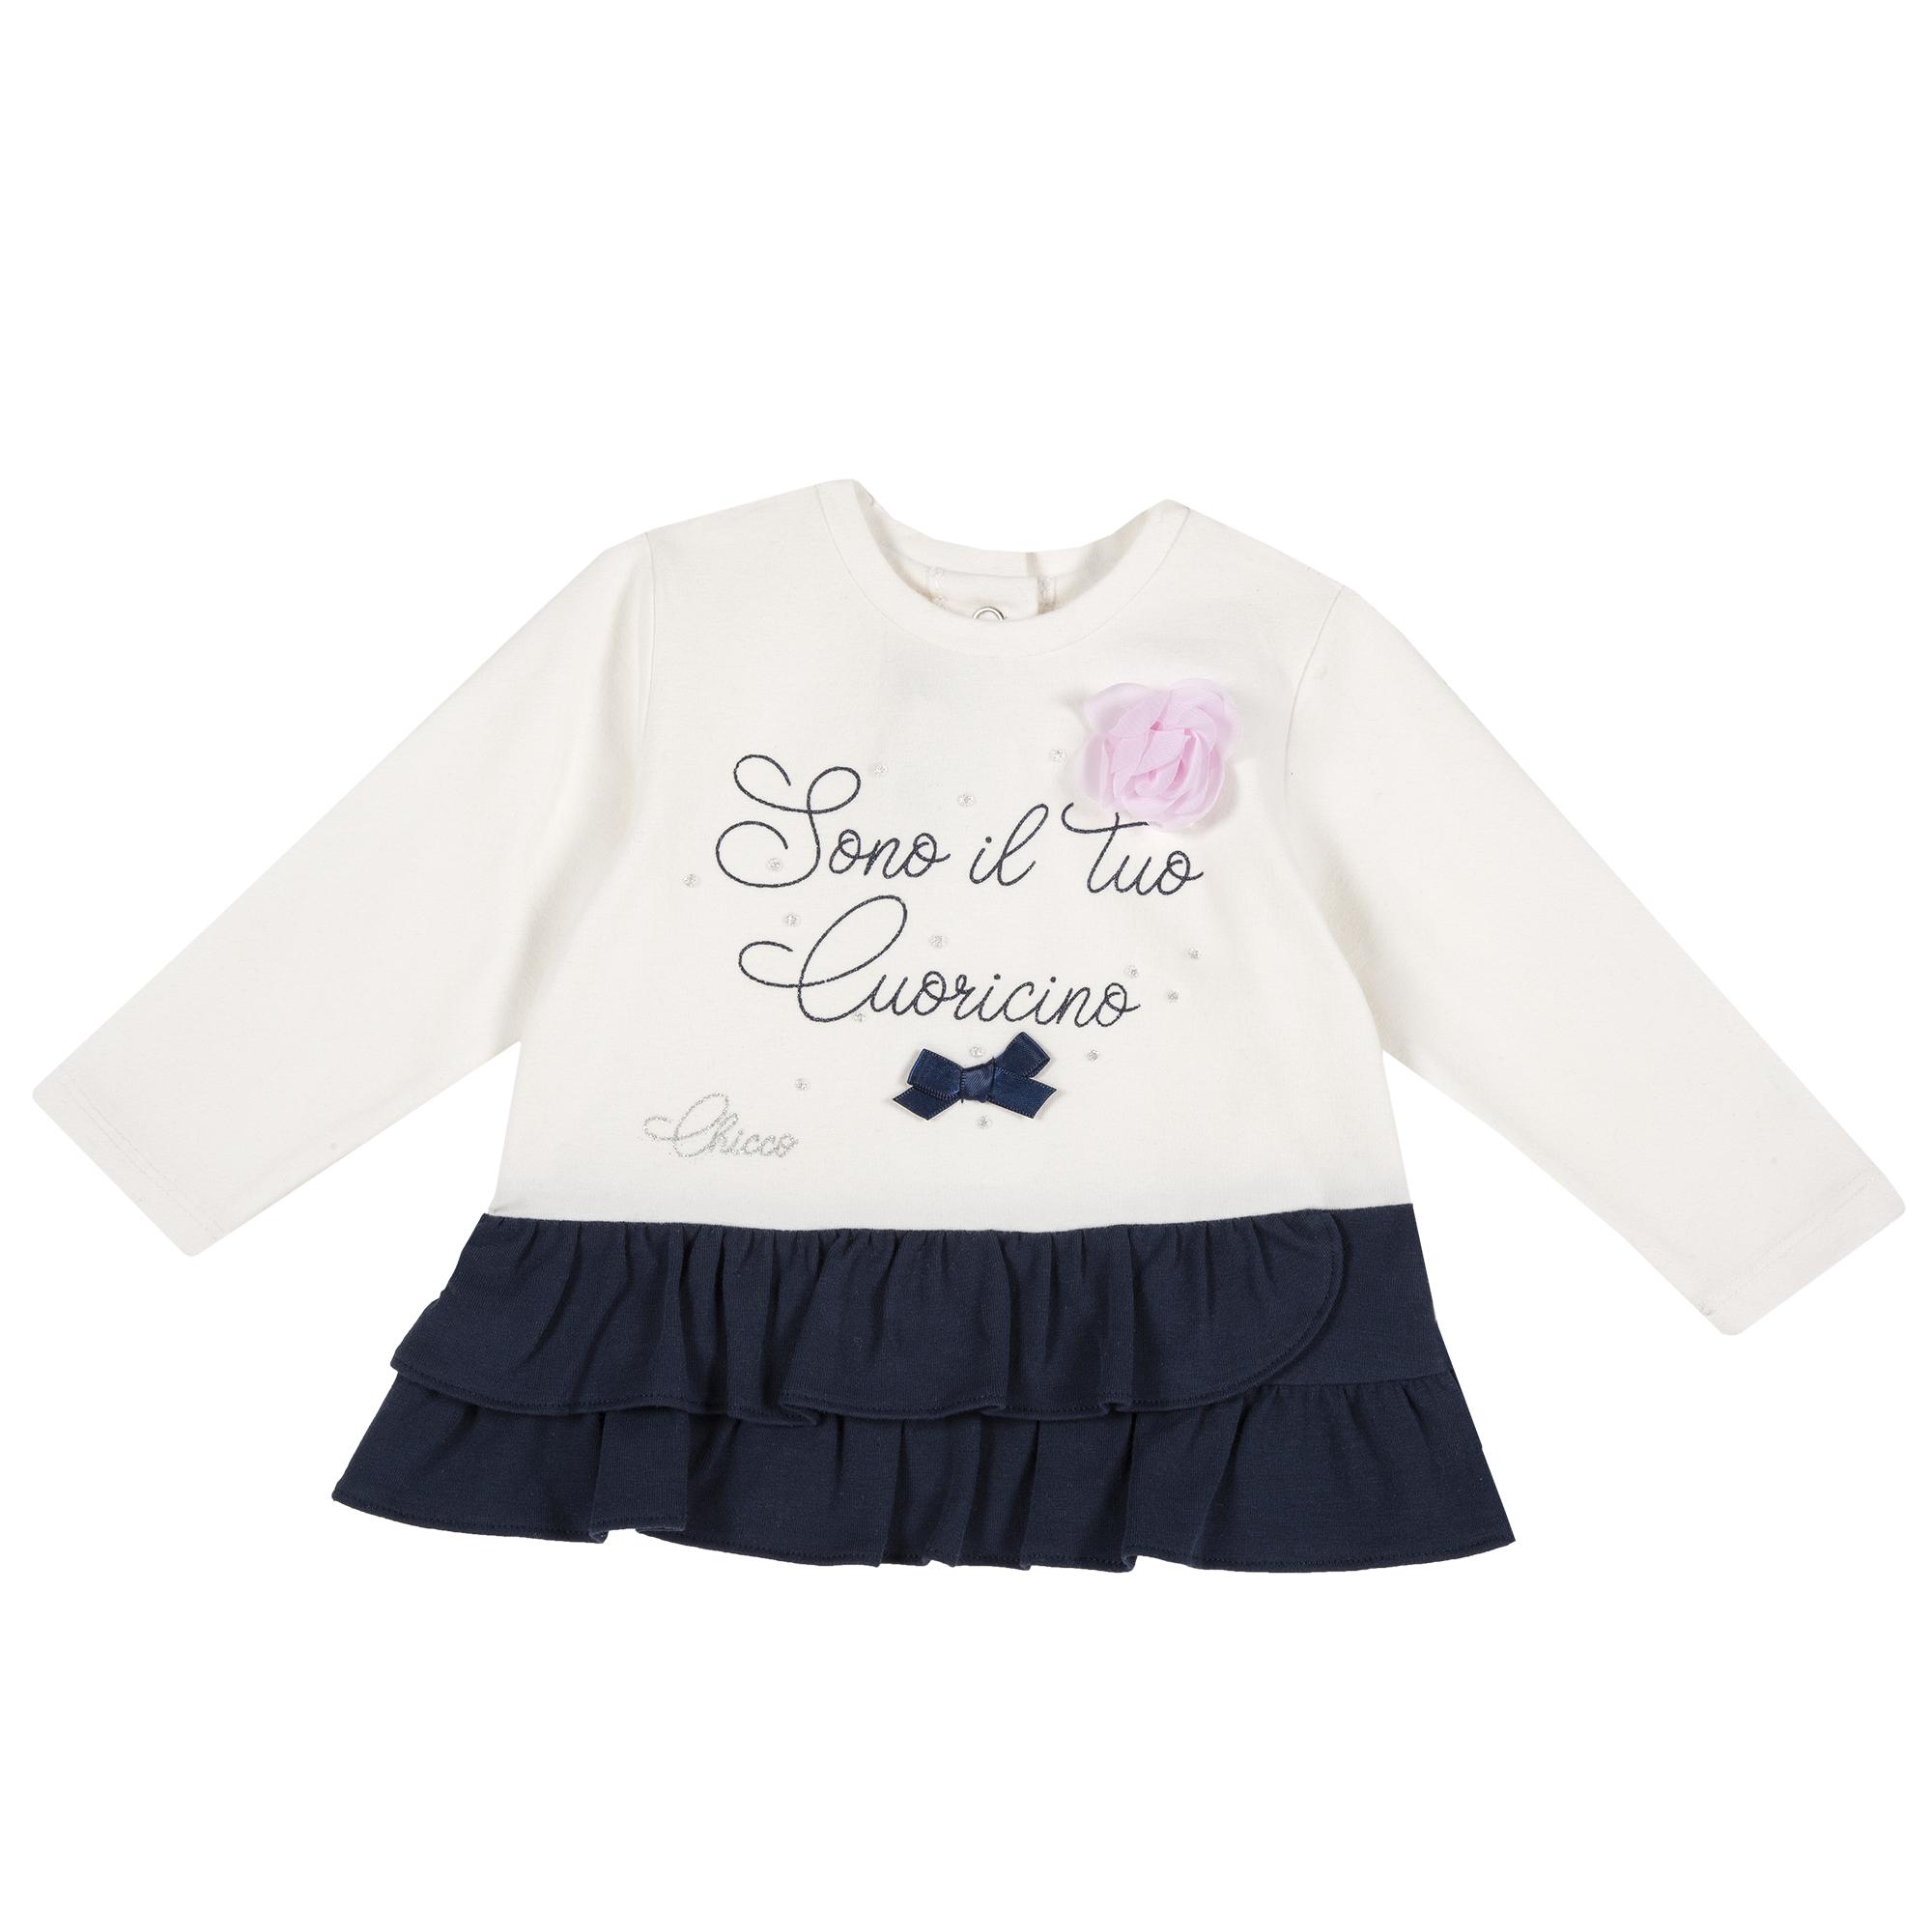 Bluza Copii Chicco, Alb Cu Model, 68643 imagine